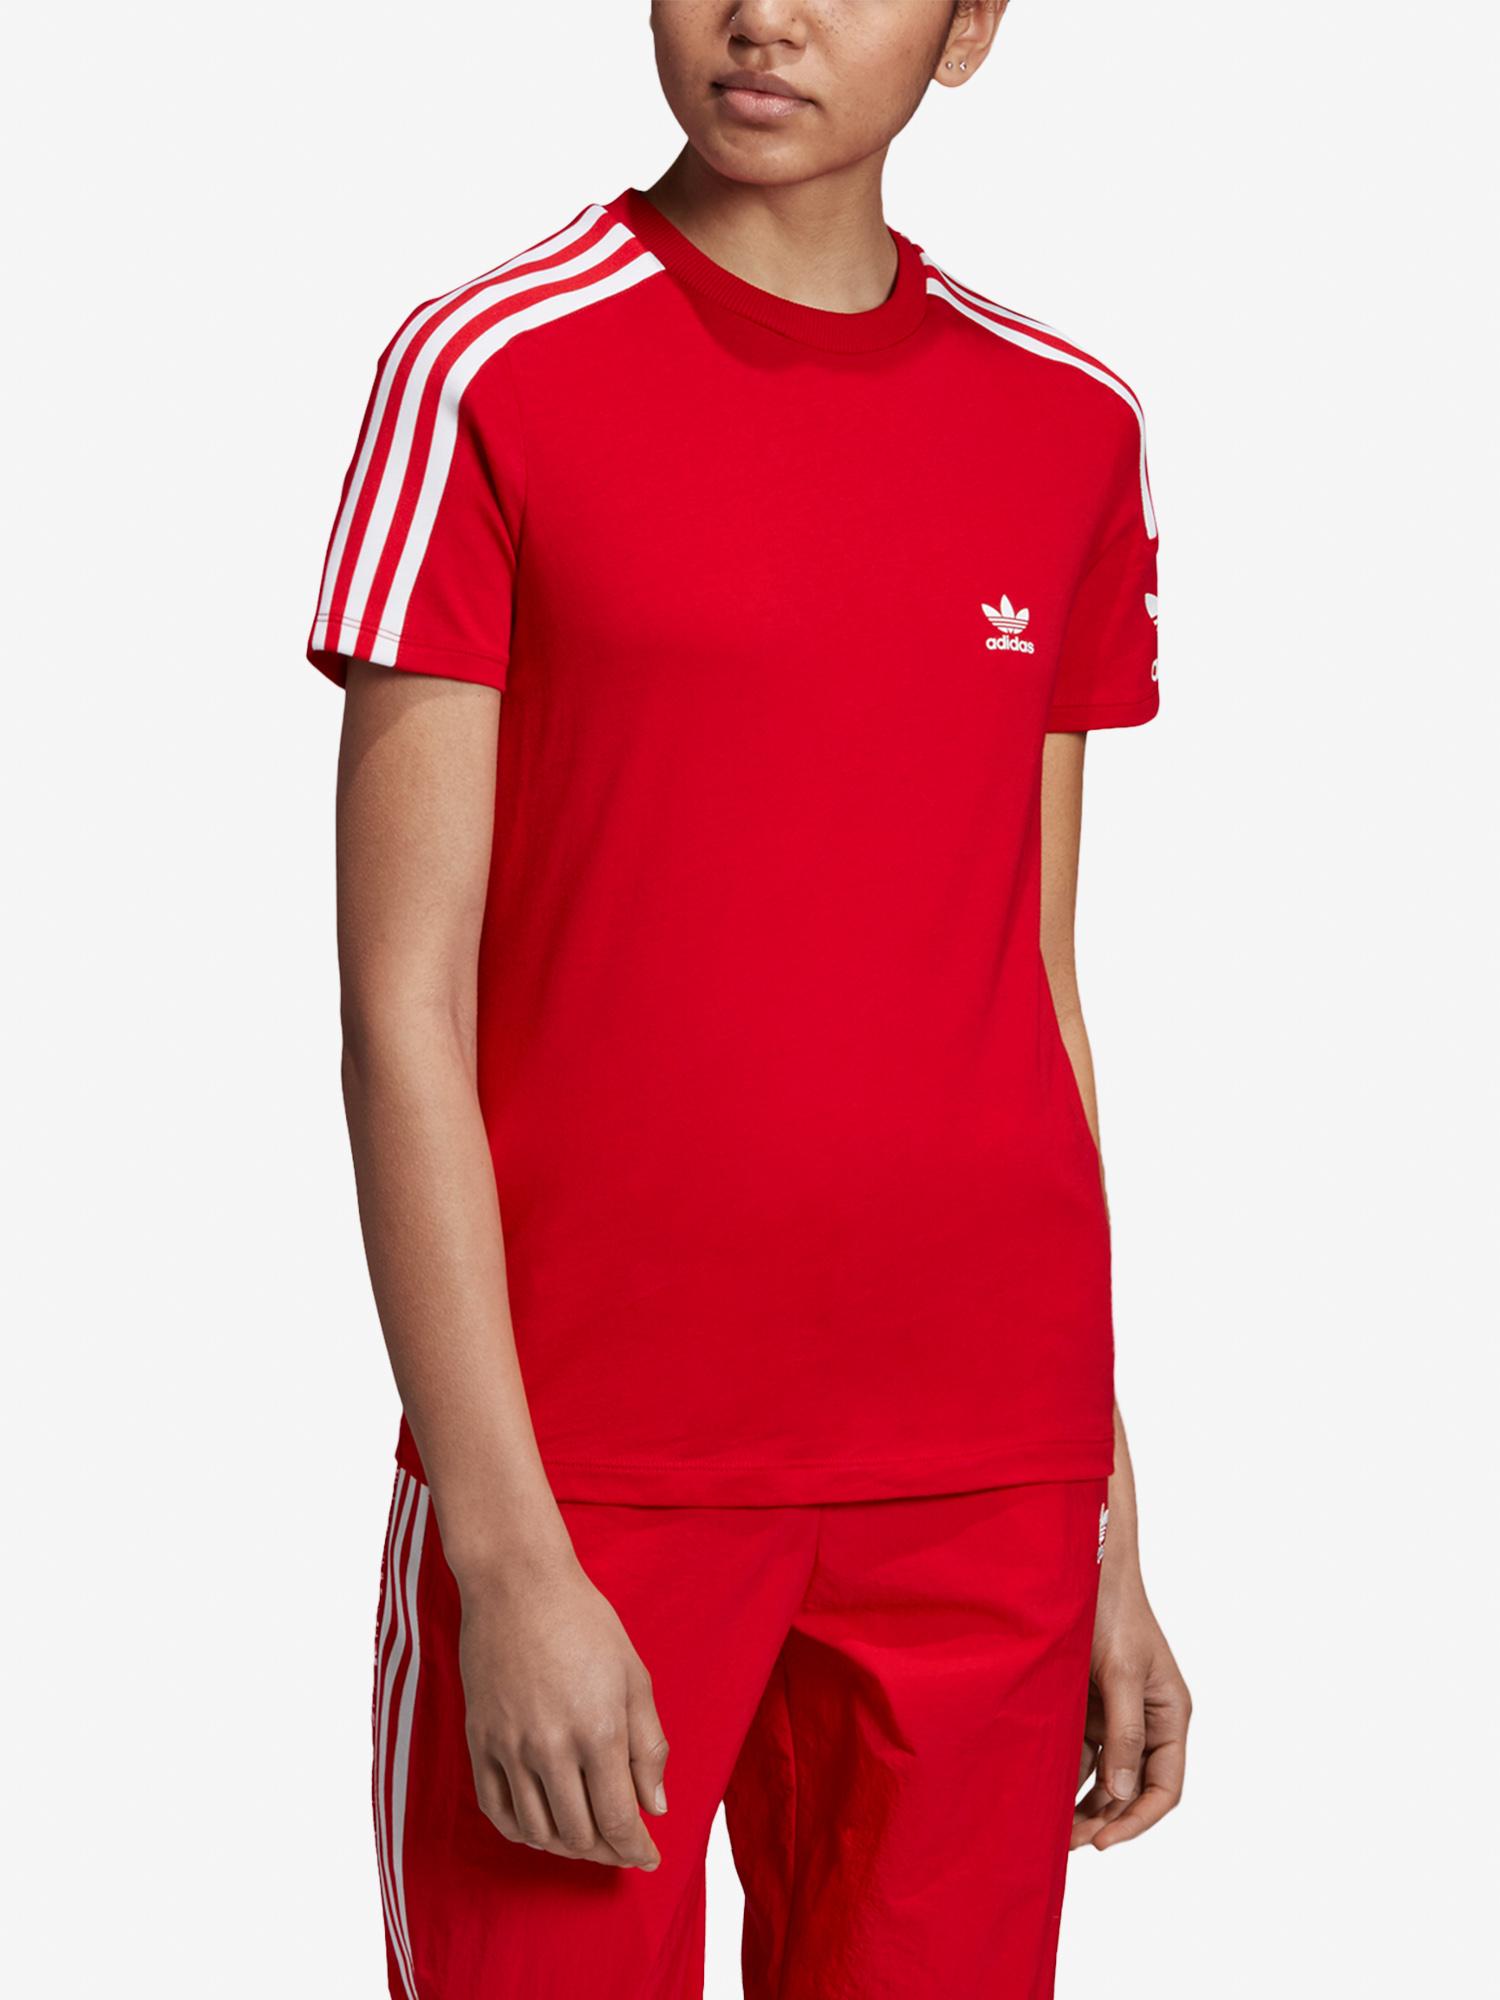 Adidas Originals Lock Up Tee T-shirt